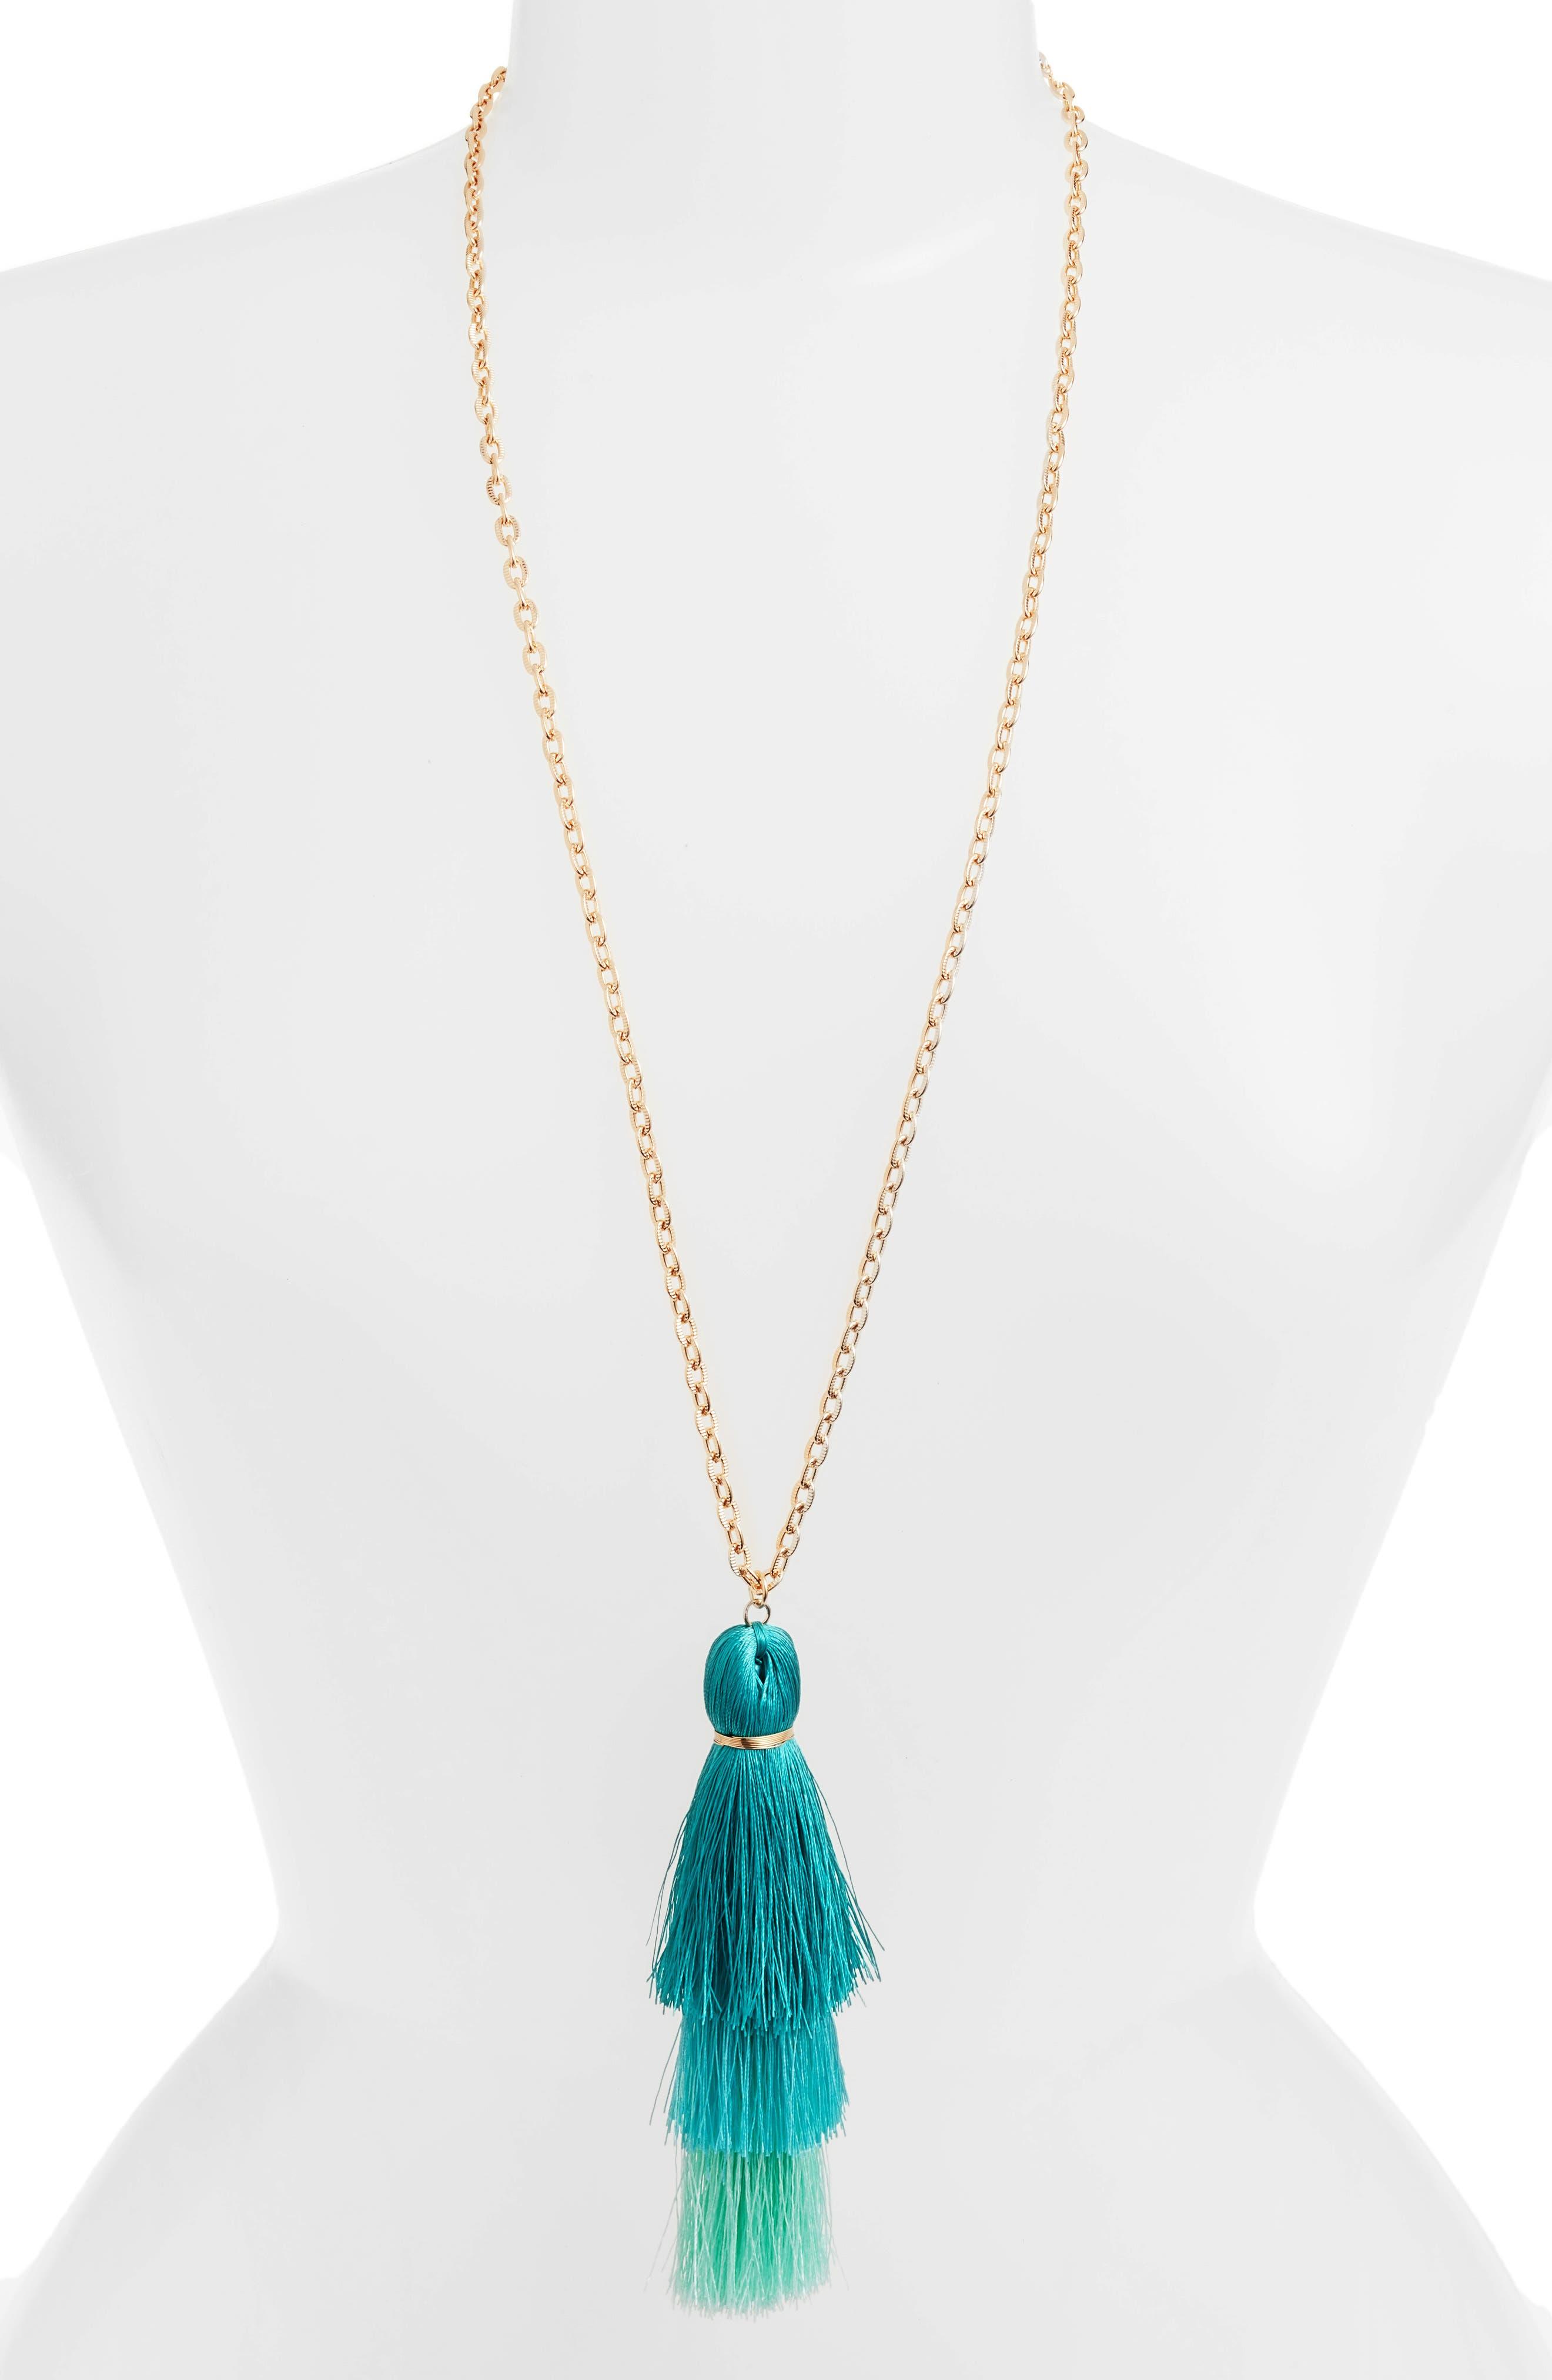 Stella + Ruby Tiered Tassel Necklace